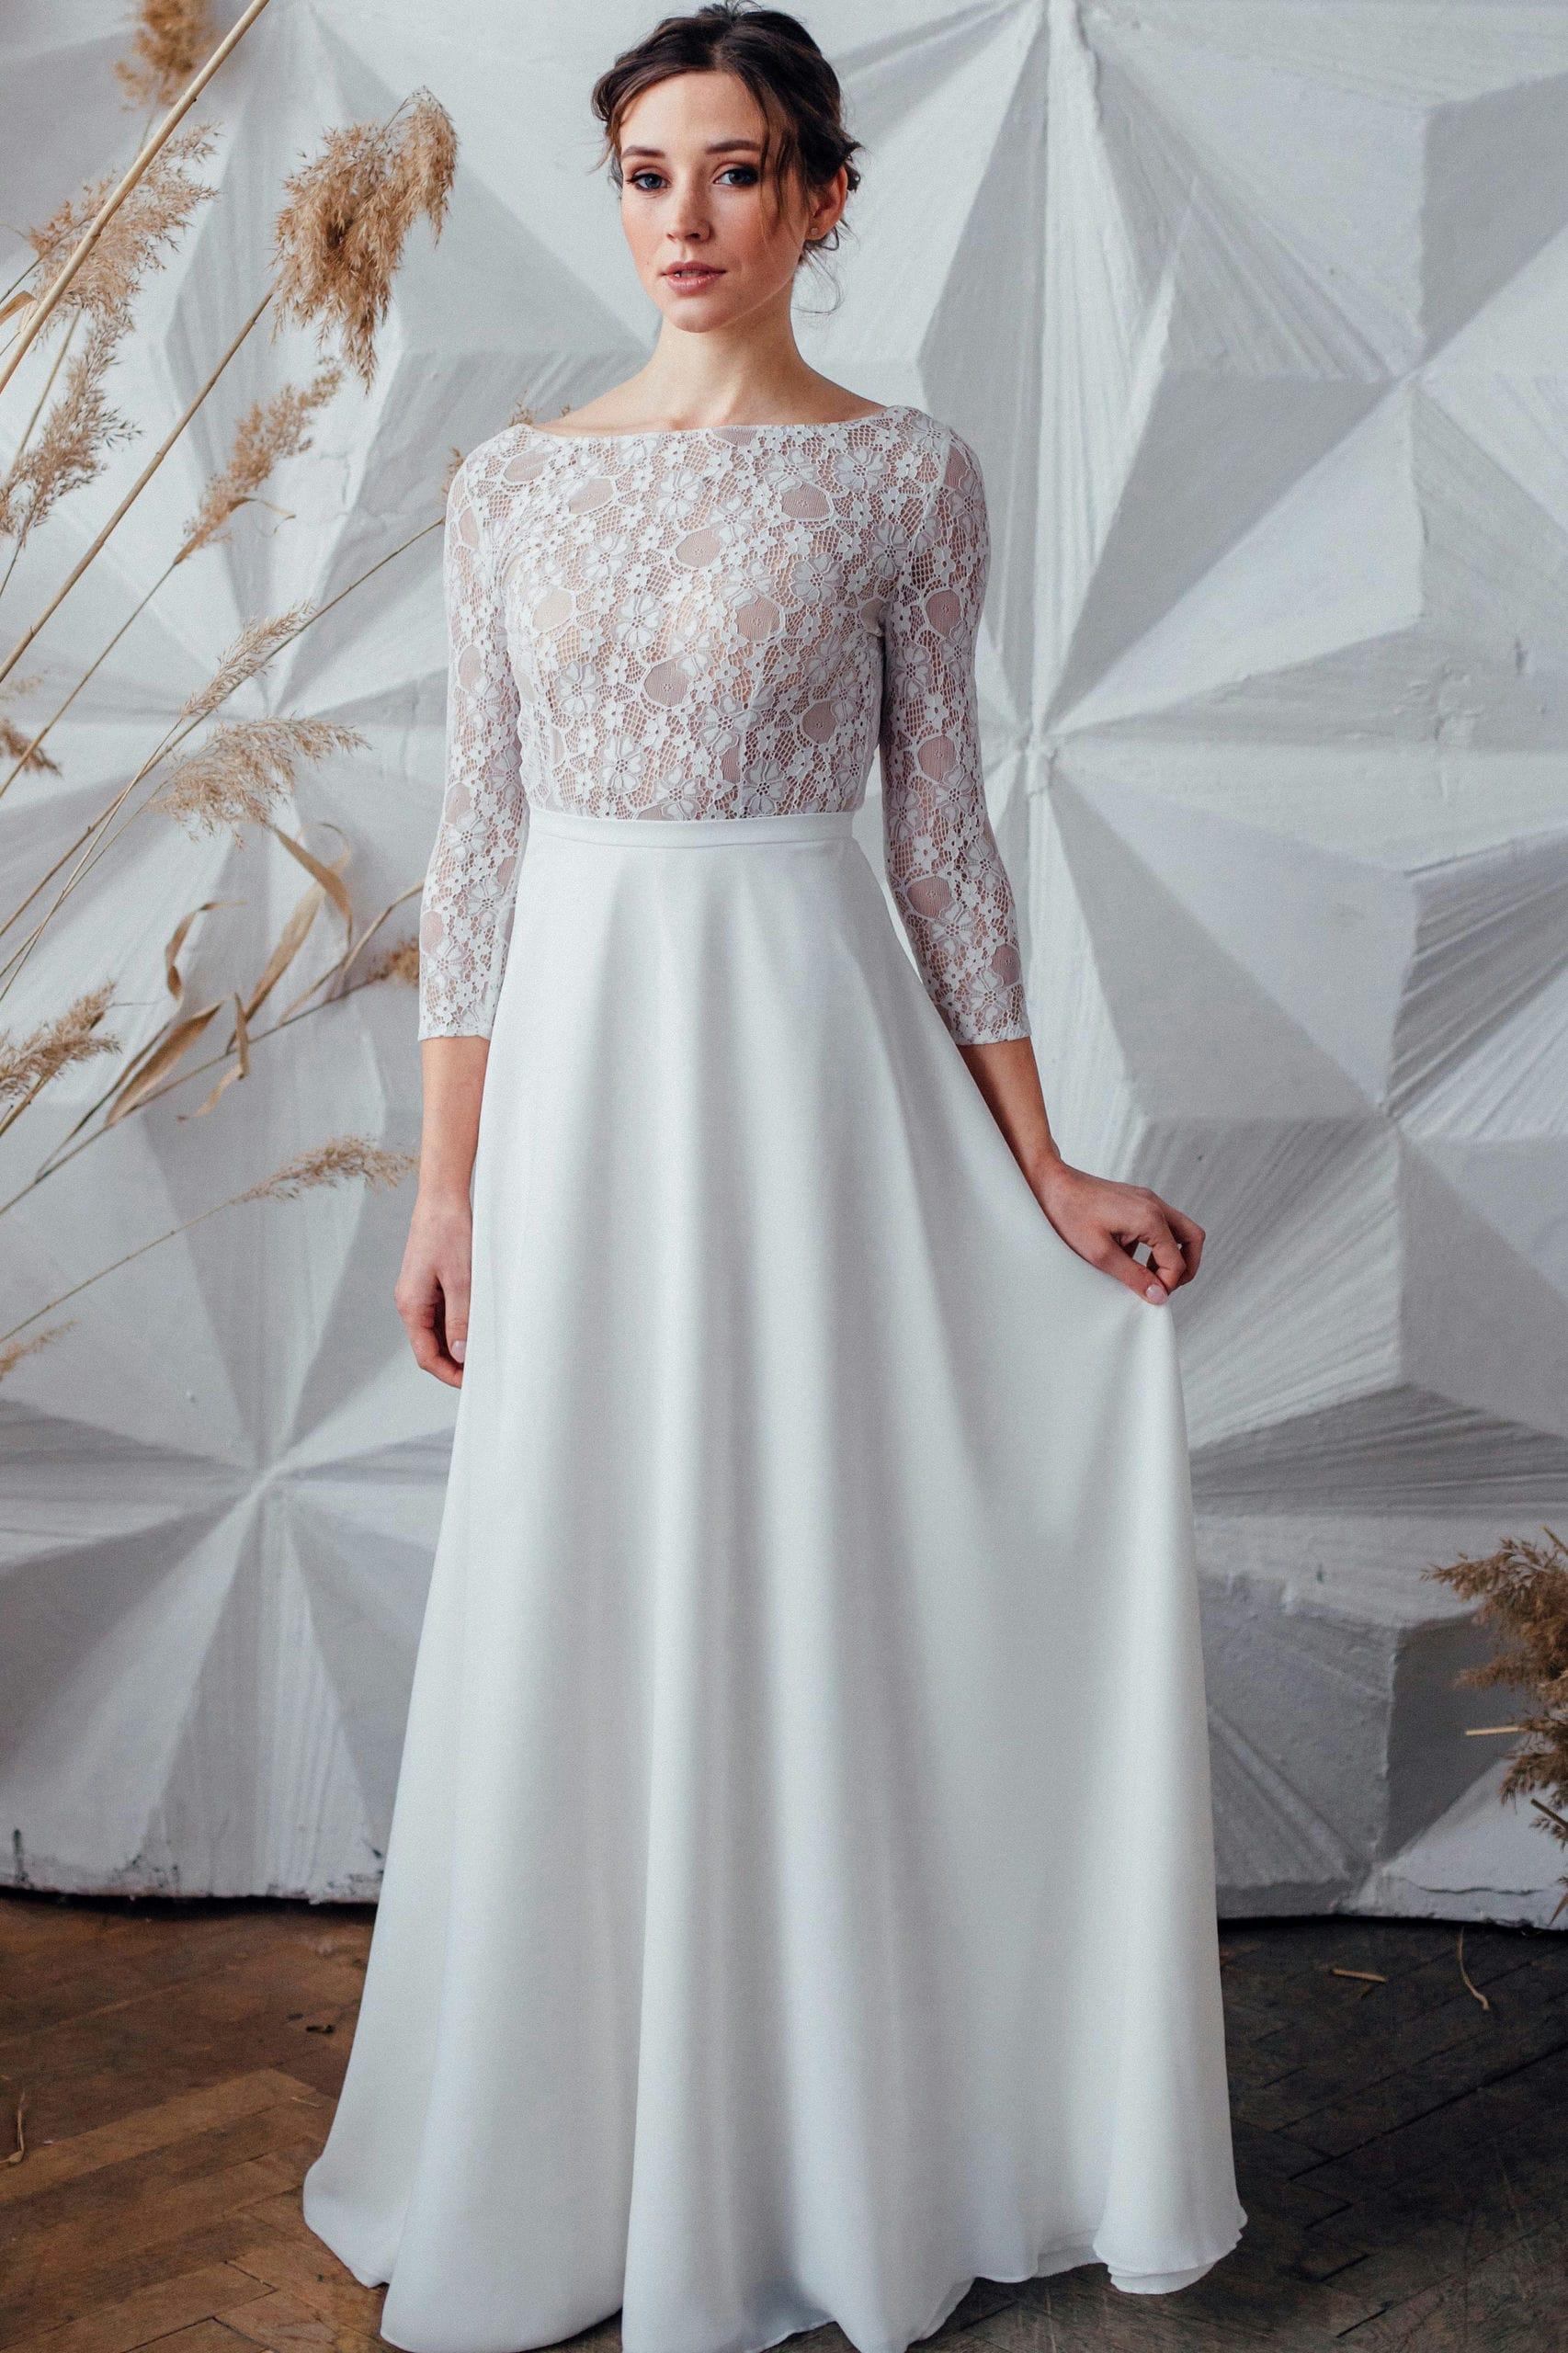 Свадебное платье NOVELLA, коллекция MAGIC OF TENDERNESS, бренд LORA SONG, фото 1